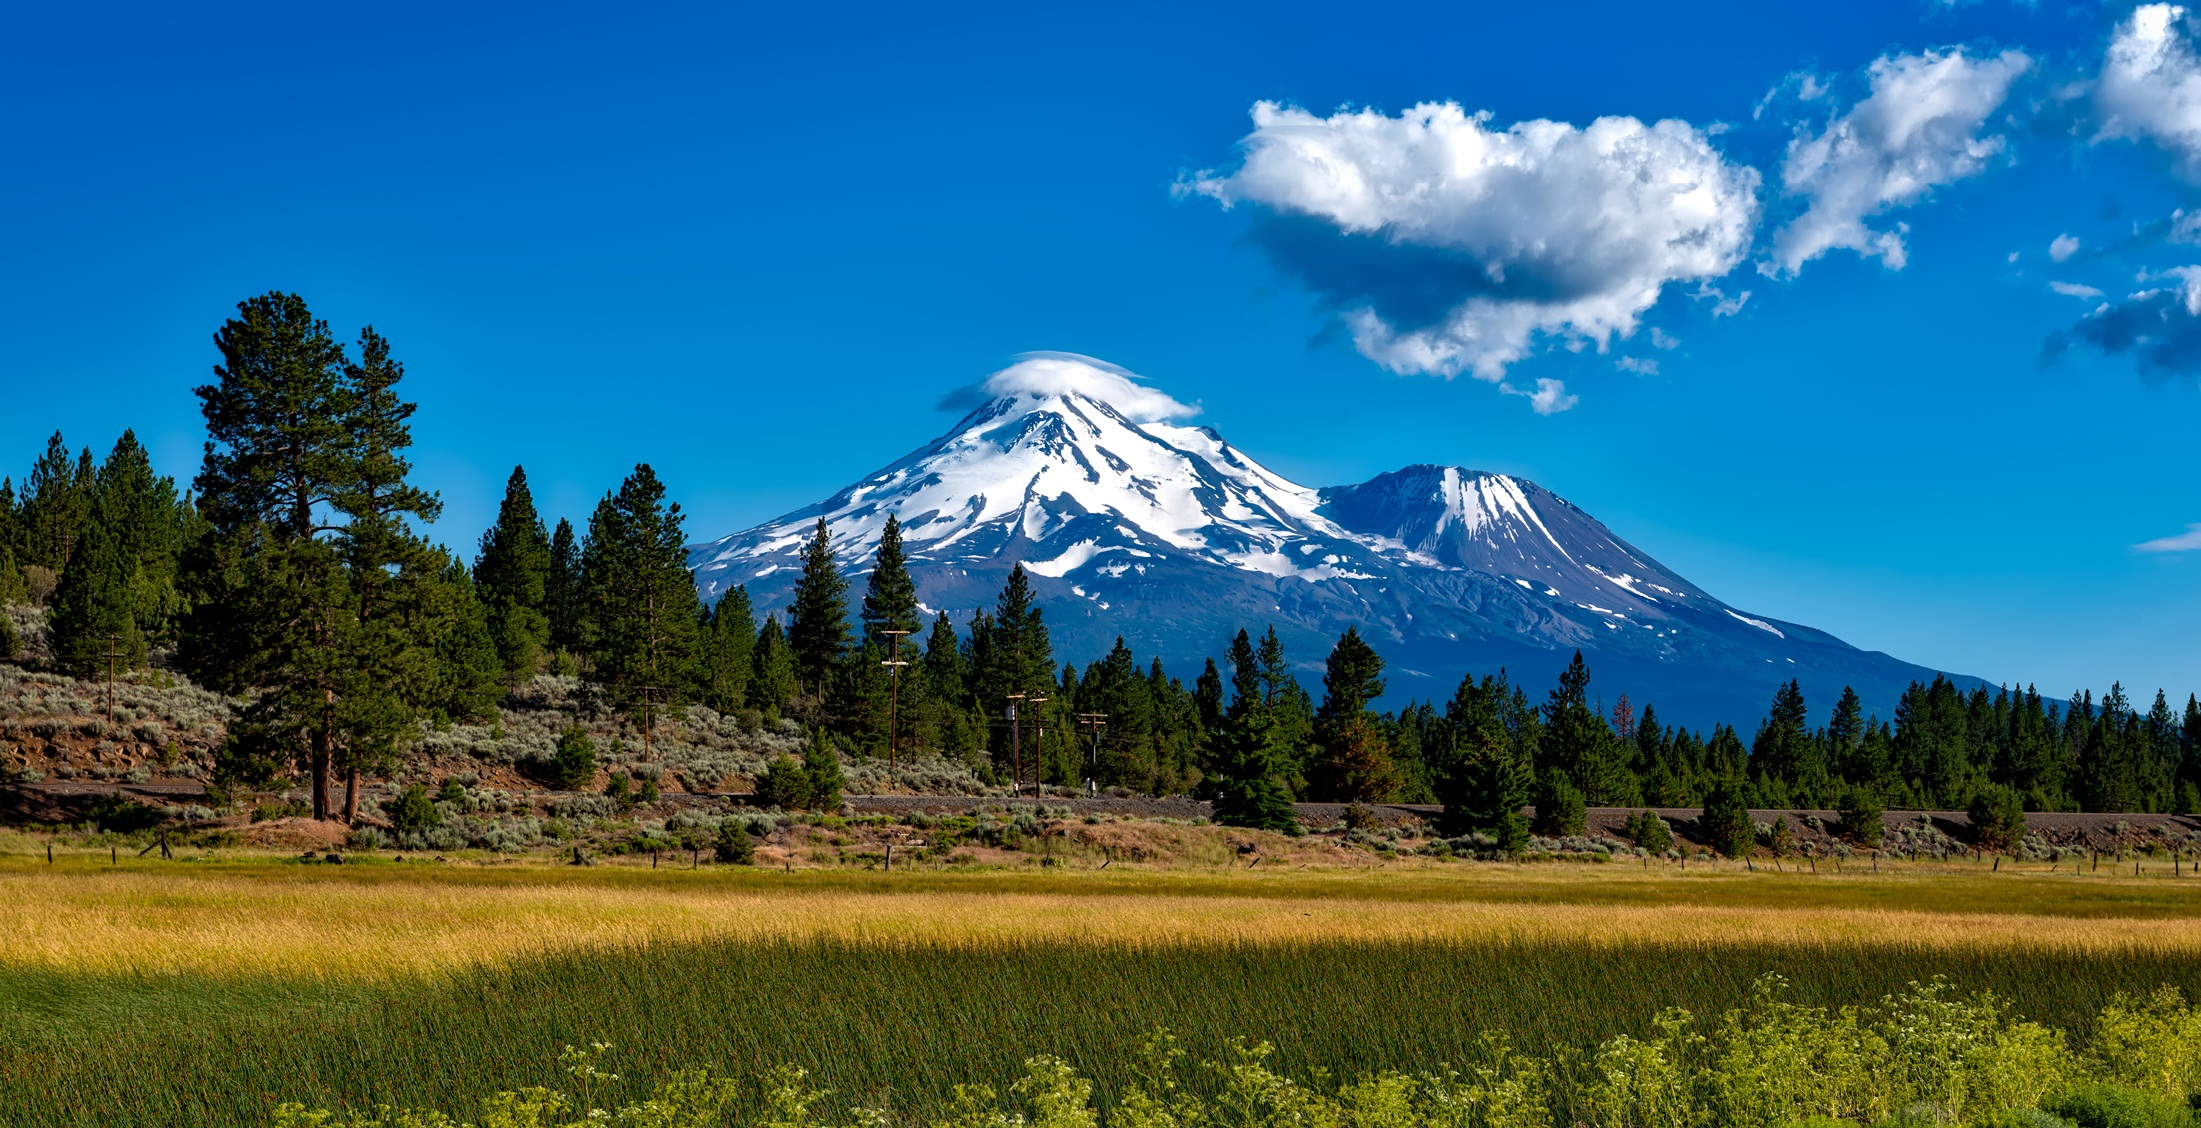 Mount shasta cascade range in siskiyou county california Usa countryside pictures